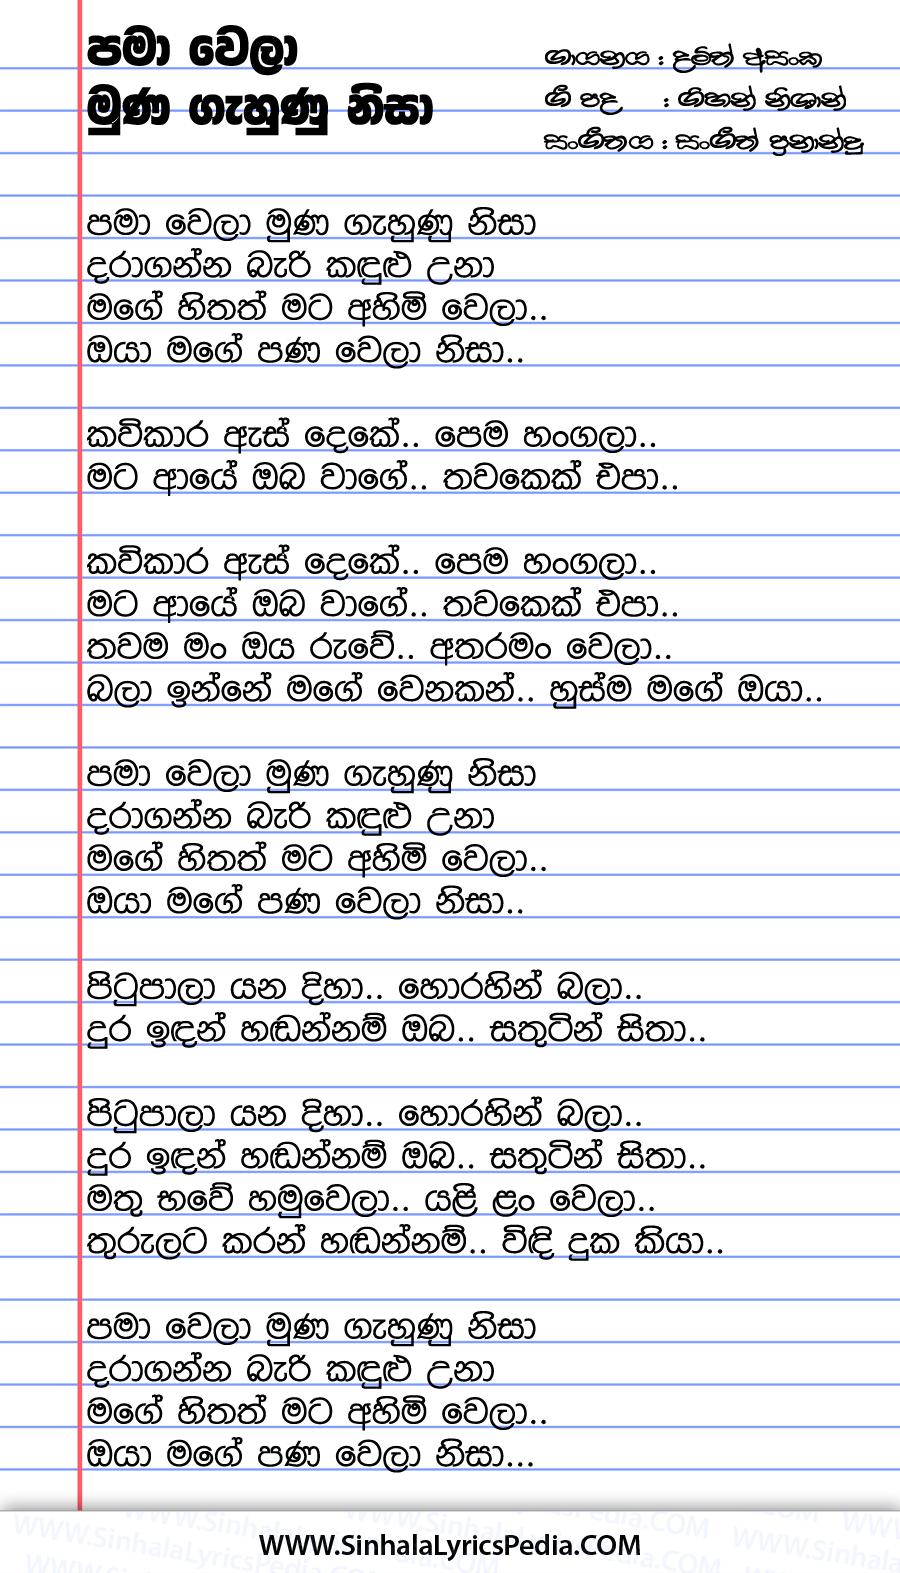 Pama Wela Muna Gahunu Nisa Song Lyrics